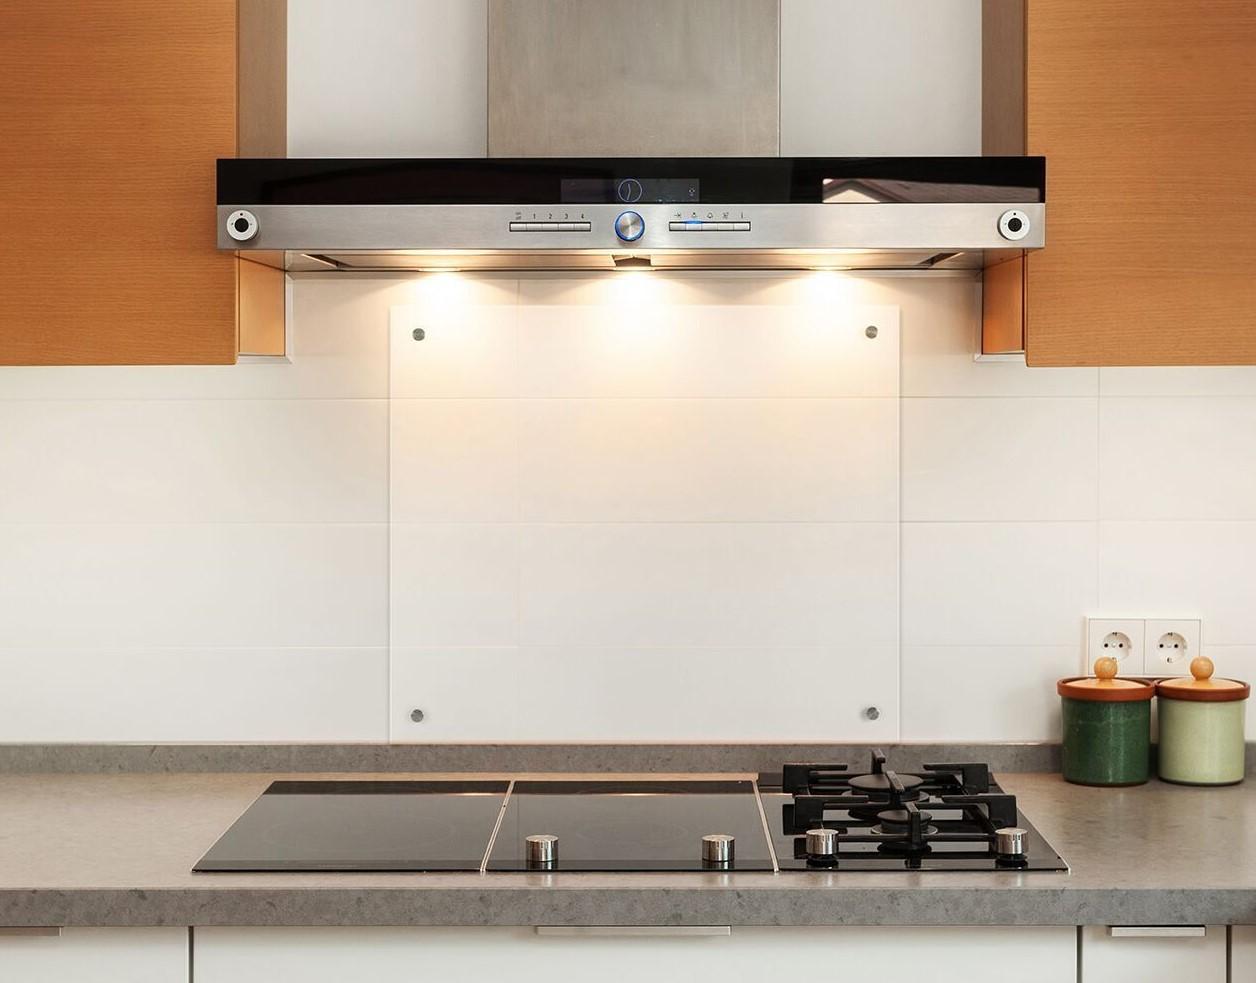 Motiv Folie selbstklebend Küchenrückwand Küche Spritzschutz